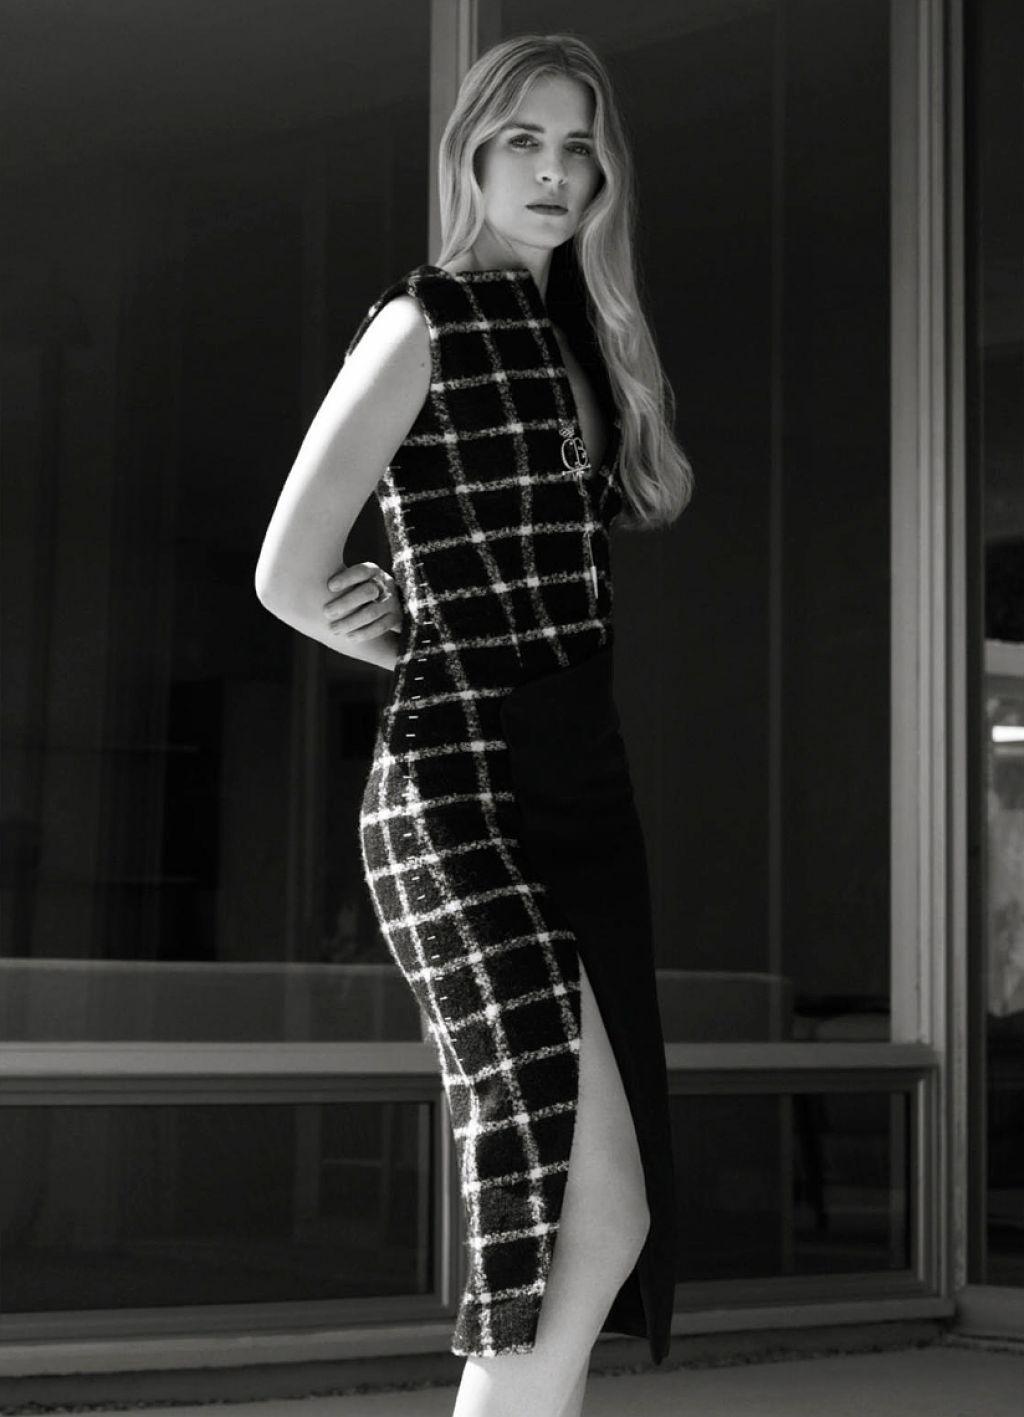 Photoshoot For Vogue Magazine November 2015: Photoshoot For InStyle October 2015